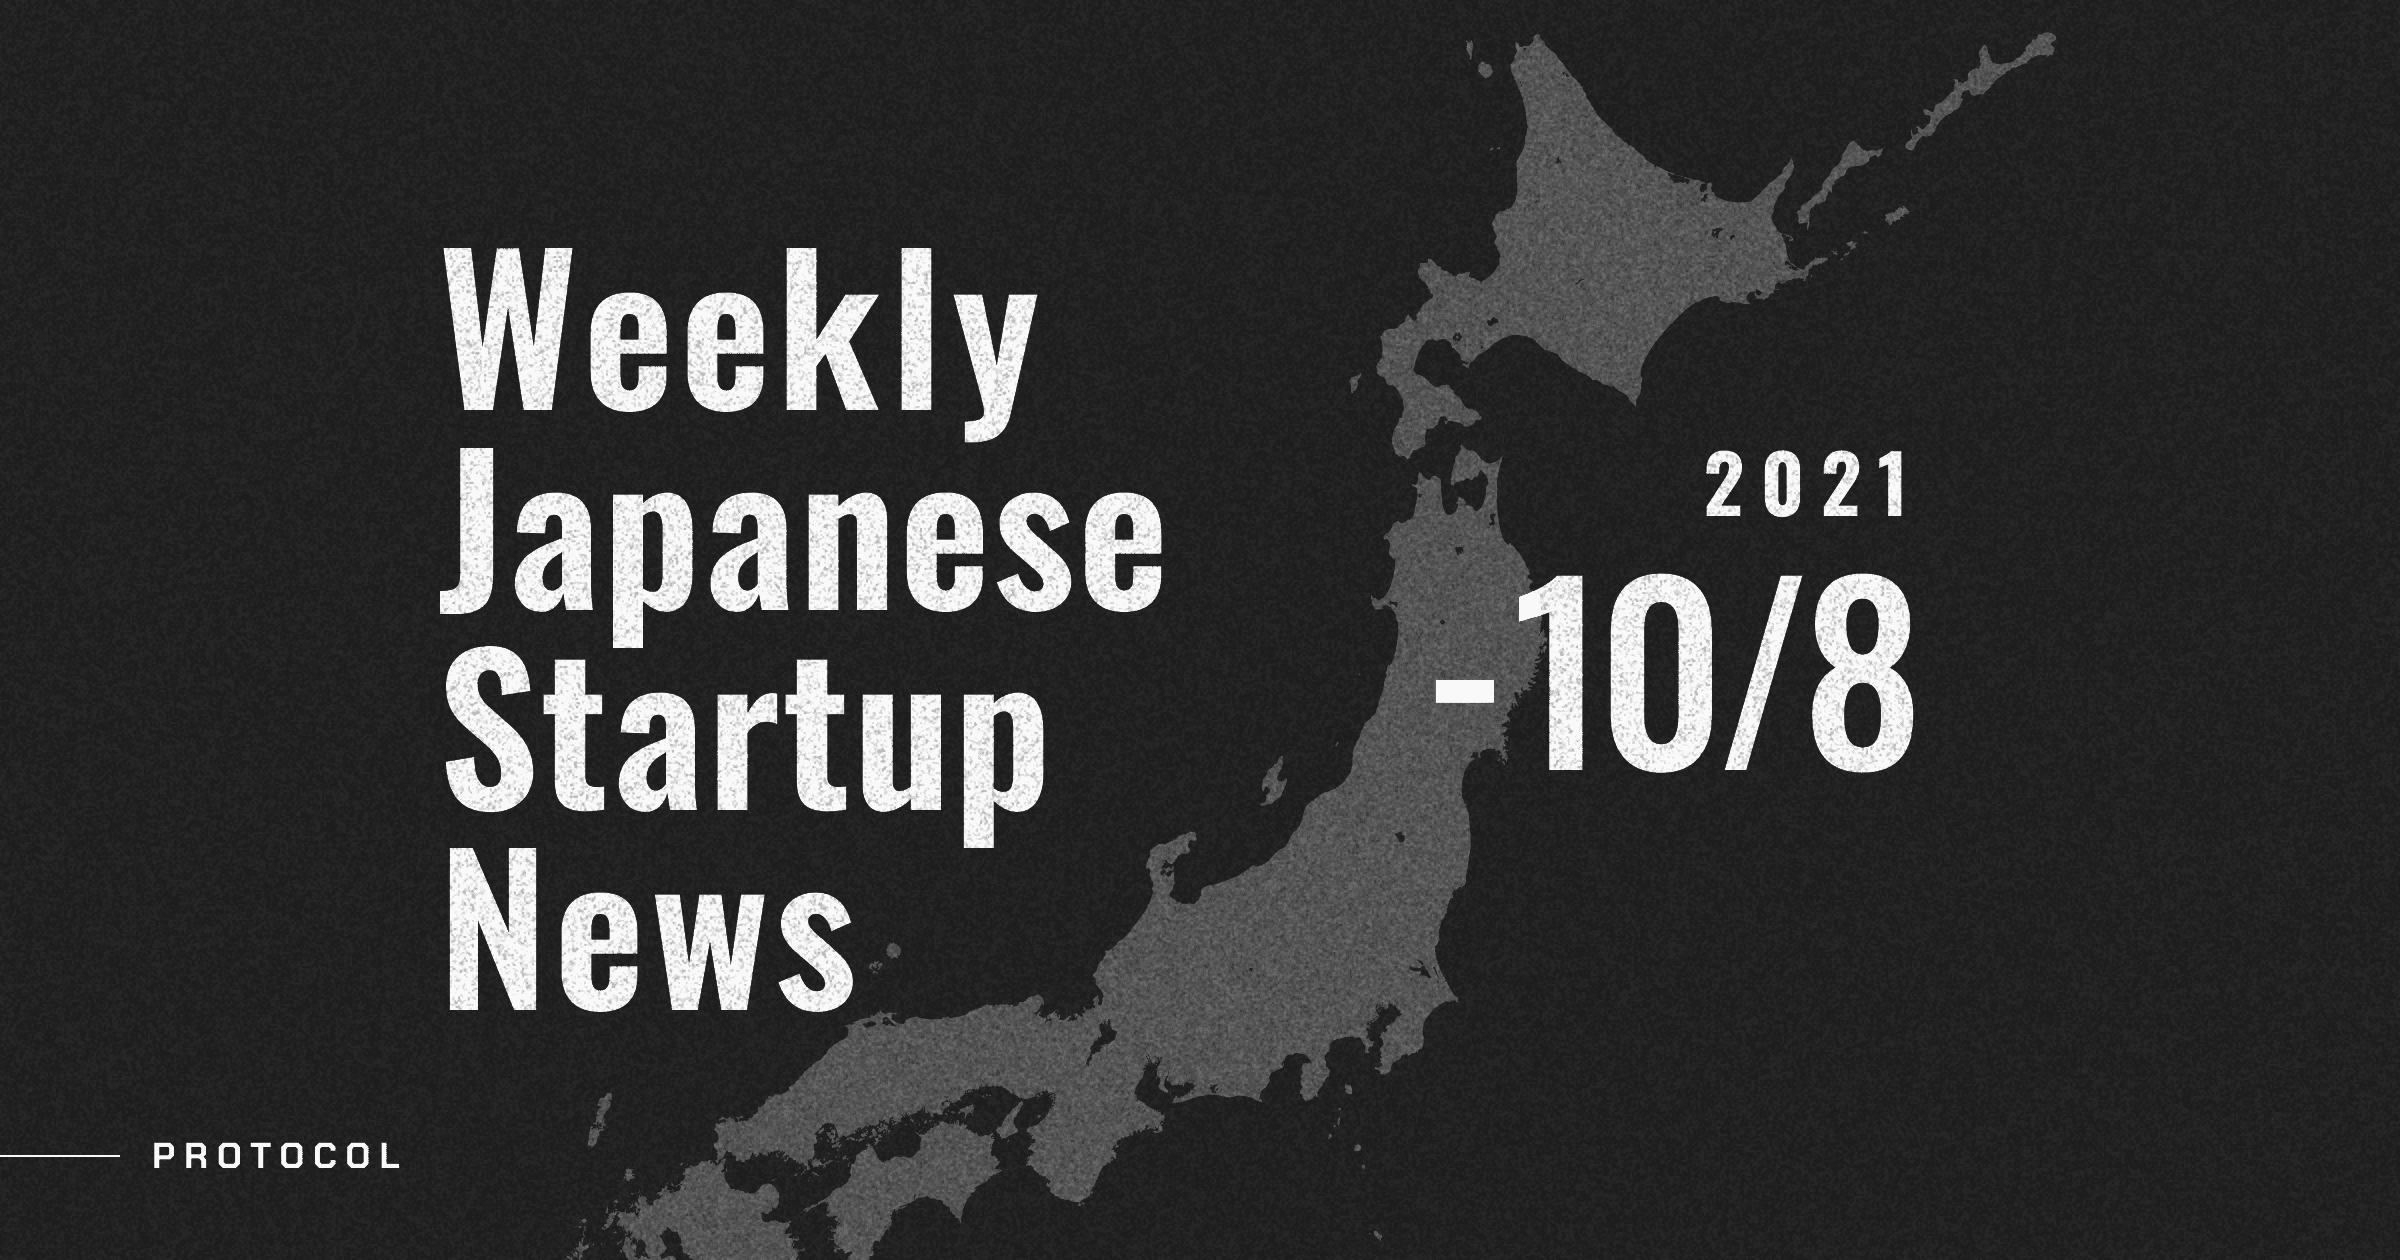 Weekly Japanese Startup News - 10/8/2021